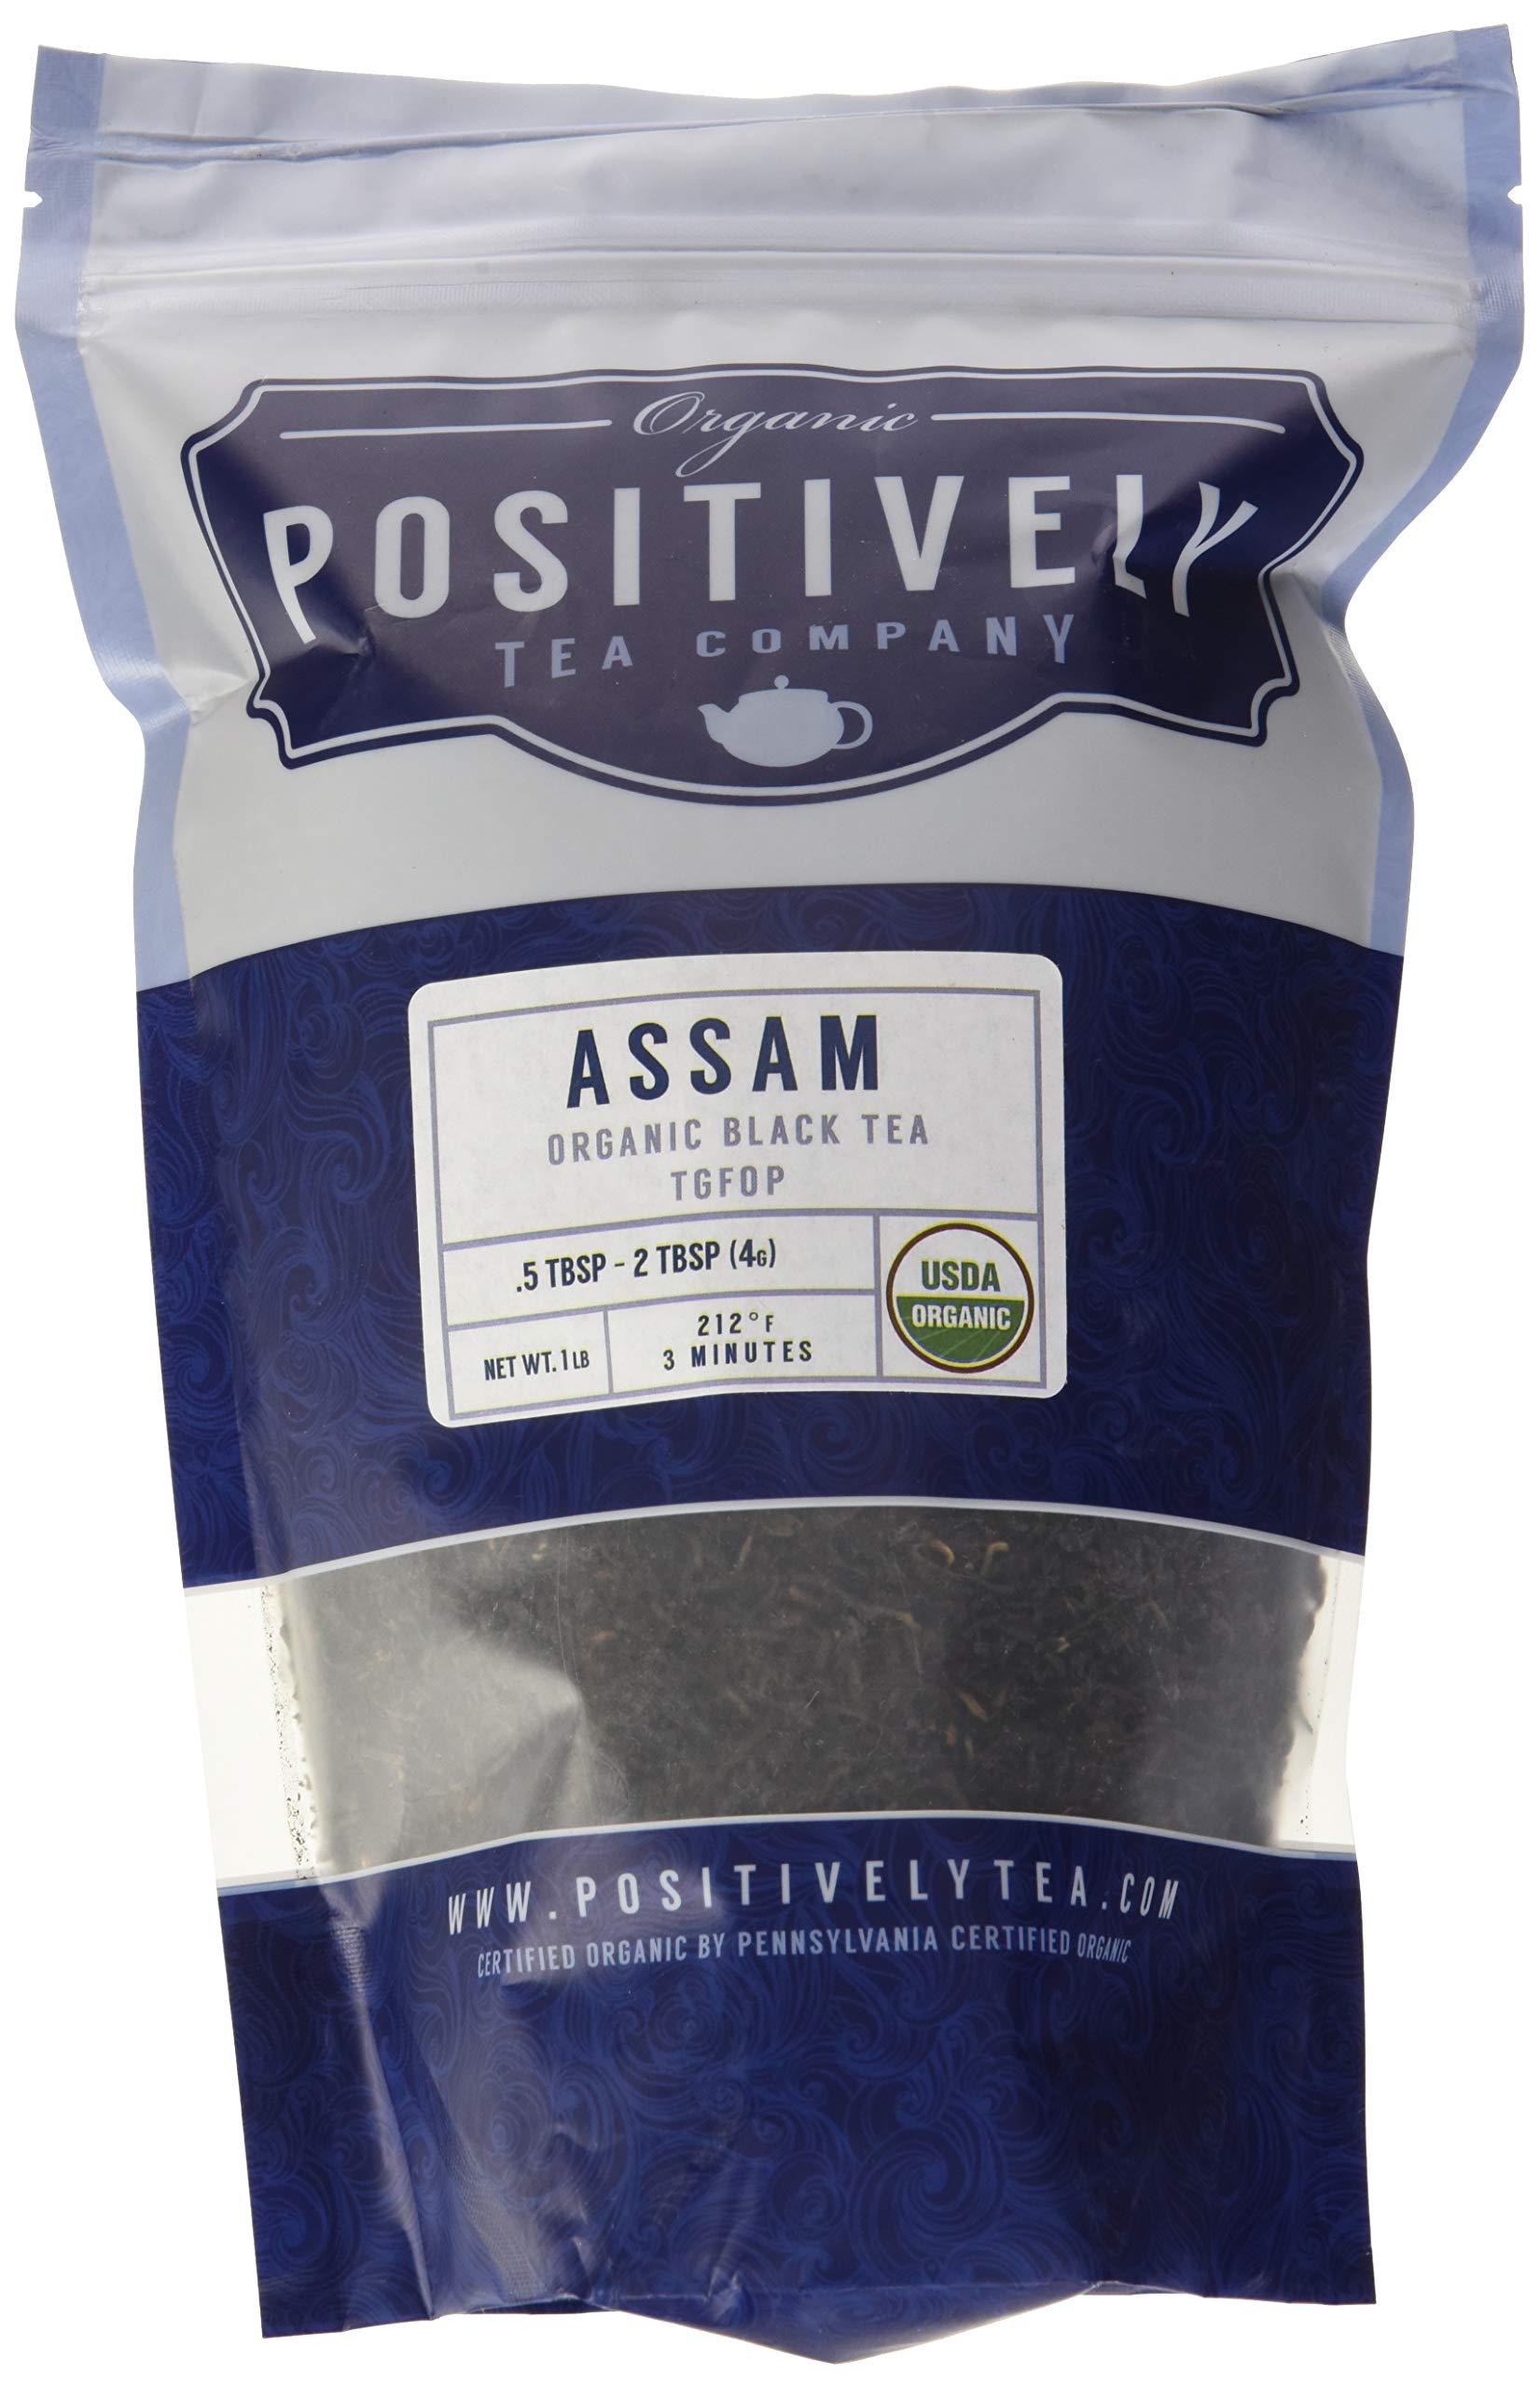 Positively Tea Company, Organic Assam TGFOP, Black Tea, Loose Leaf, USDA Organic, 1 Pound Bag